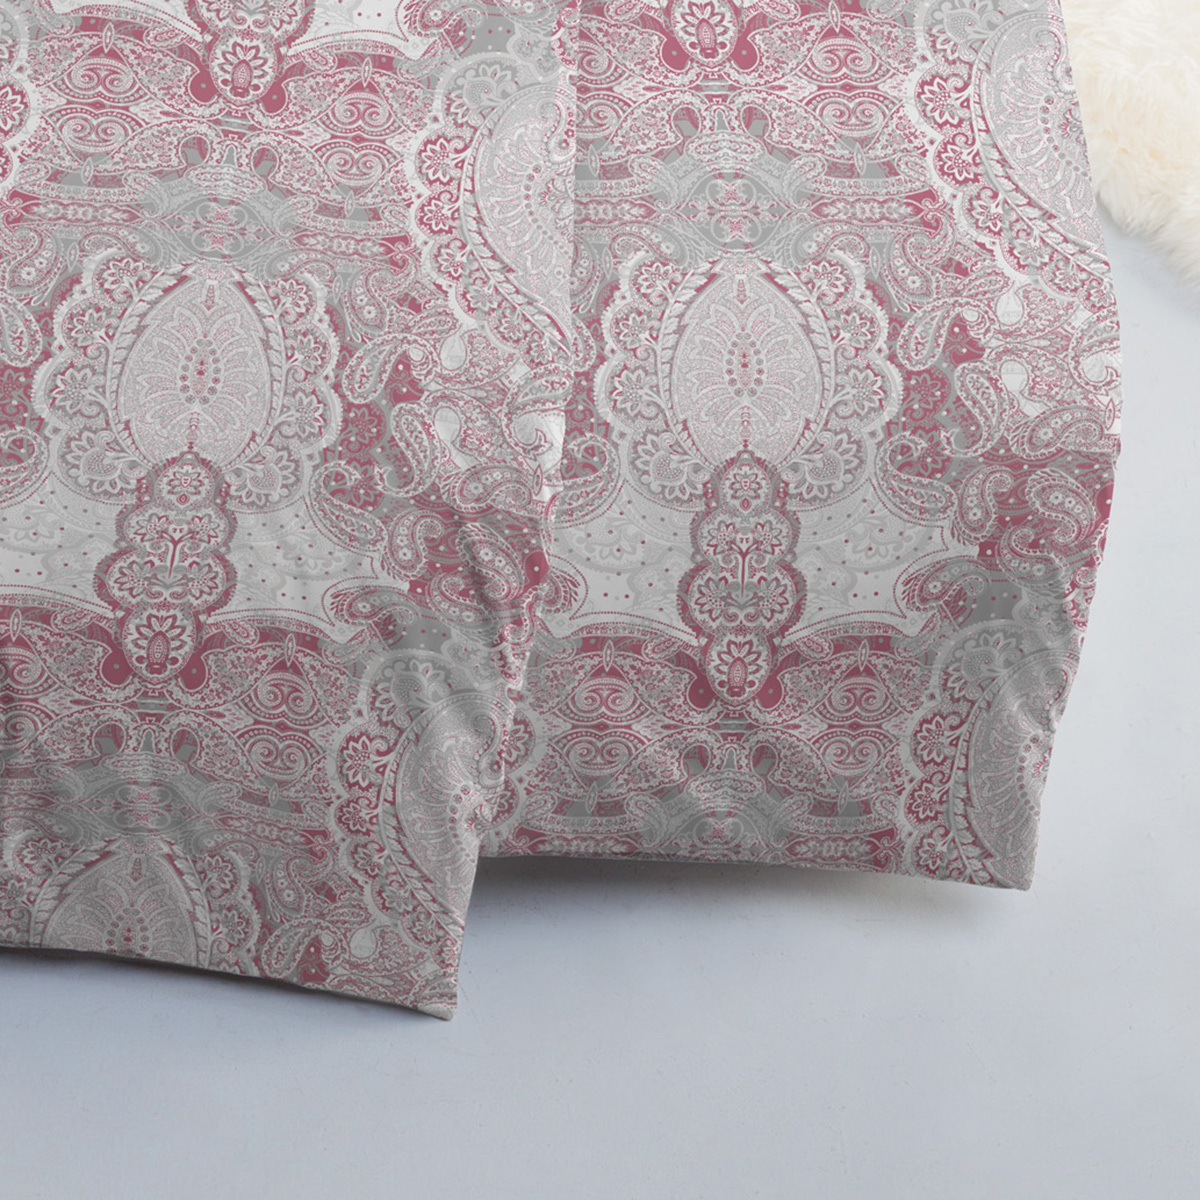 estella mako interlock jersey bettw sche 6217 405 vino. Black Bedroom Furniture Sets. Home Design Ideas